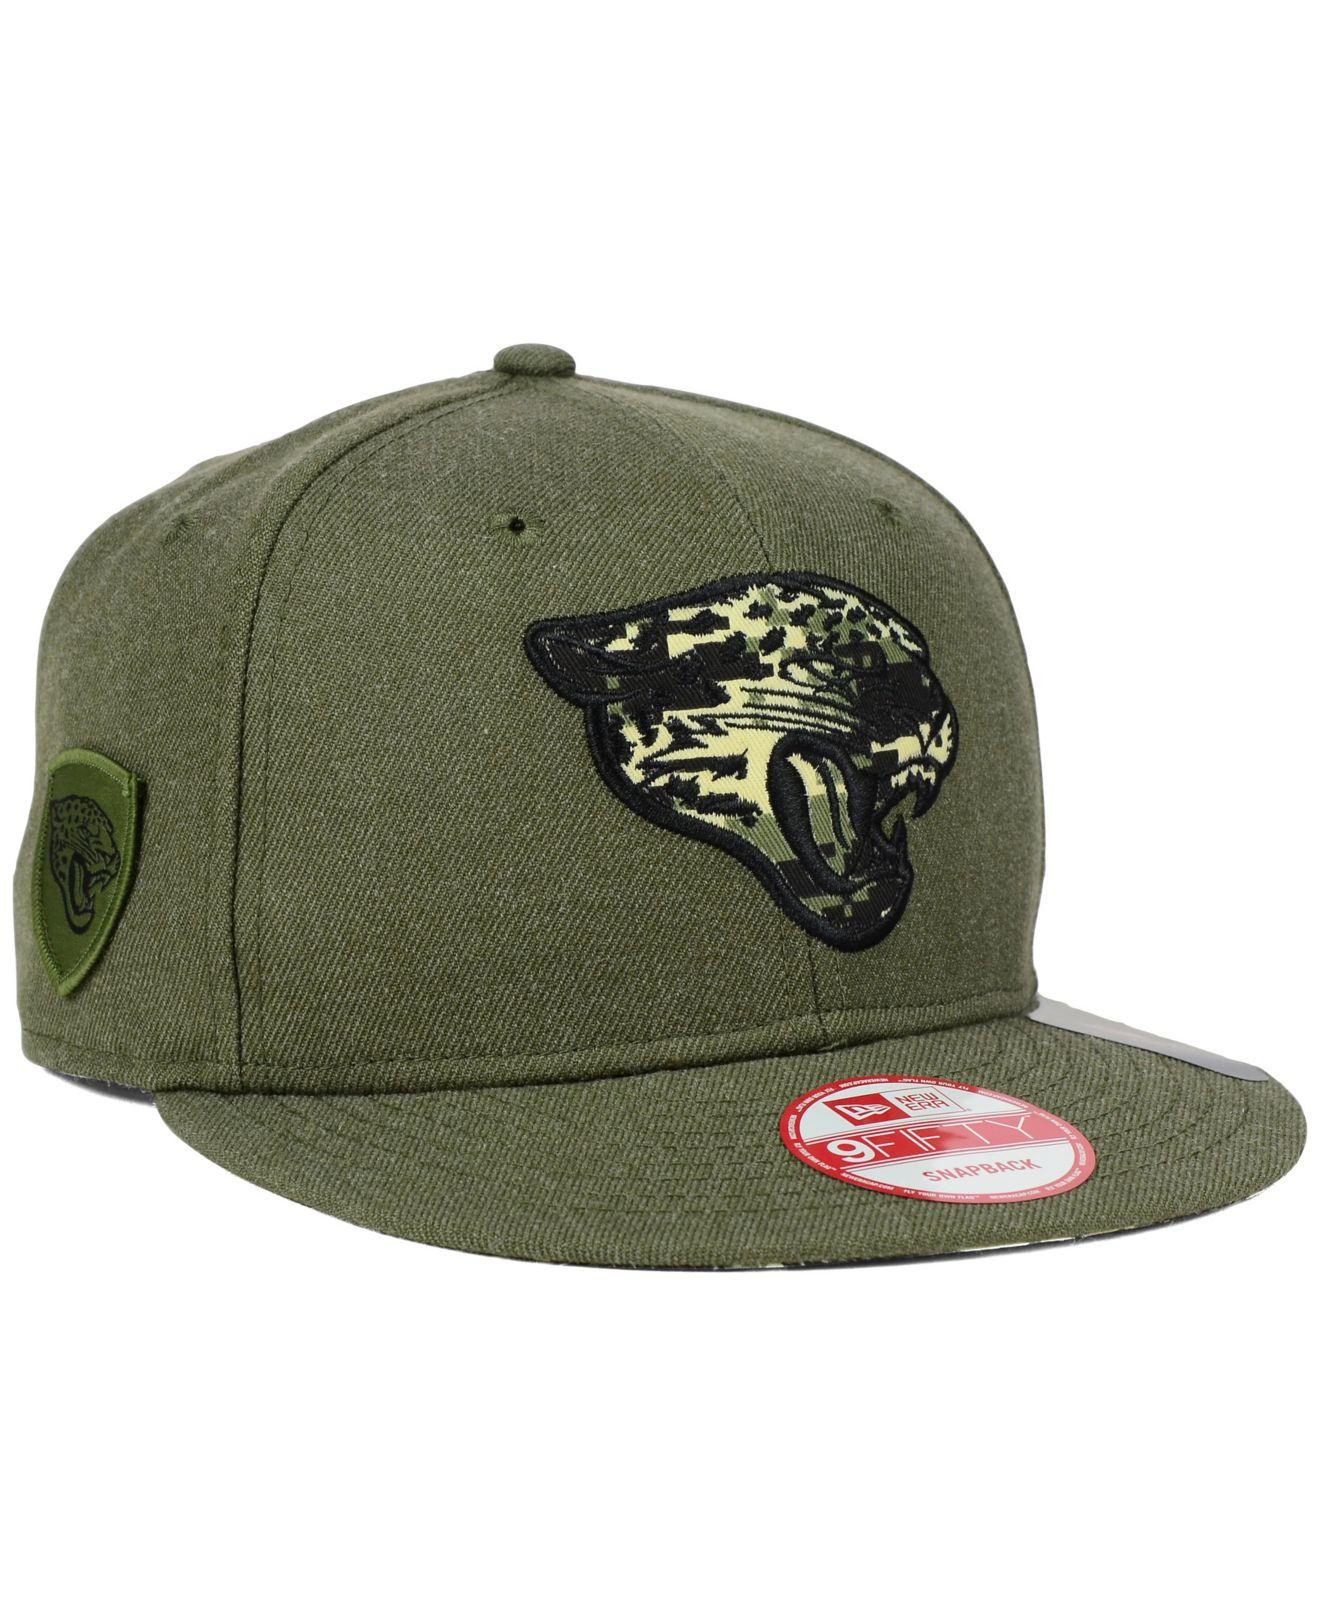 ktz jacksonville jaguars camo 9fifty snapback cap in green. Black Bedroom Furniture Sets. Home Design Ideas